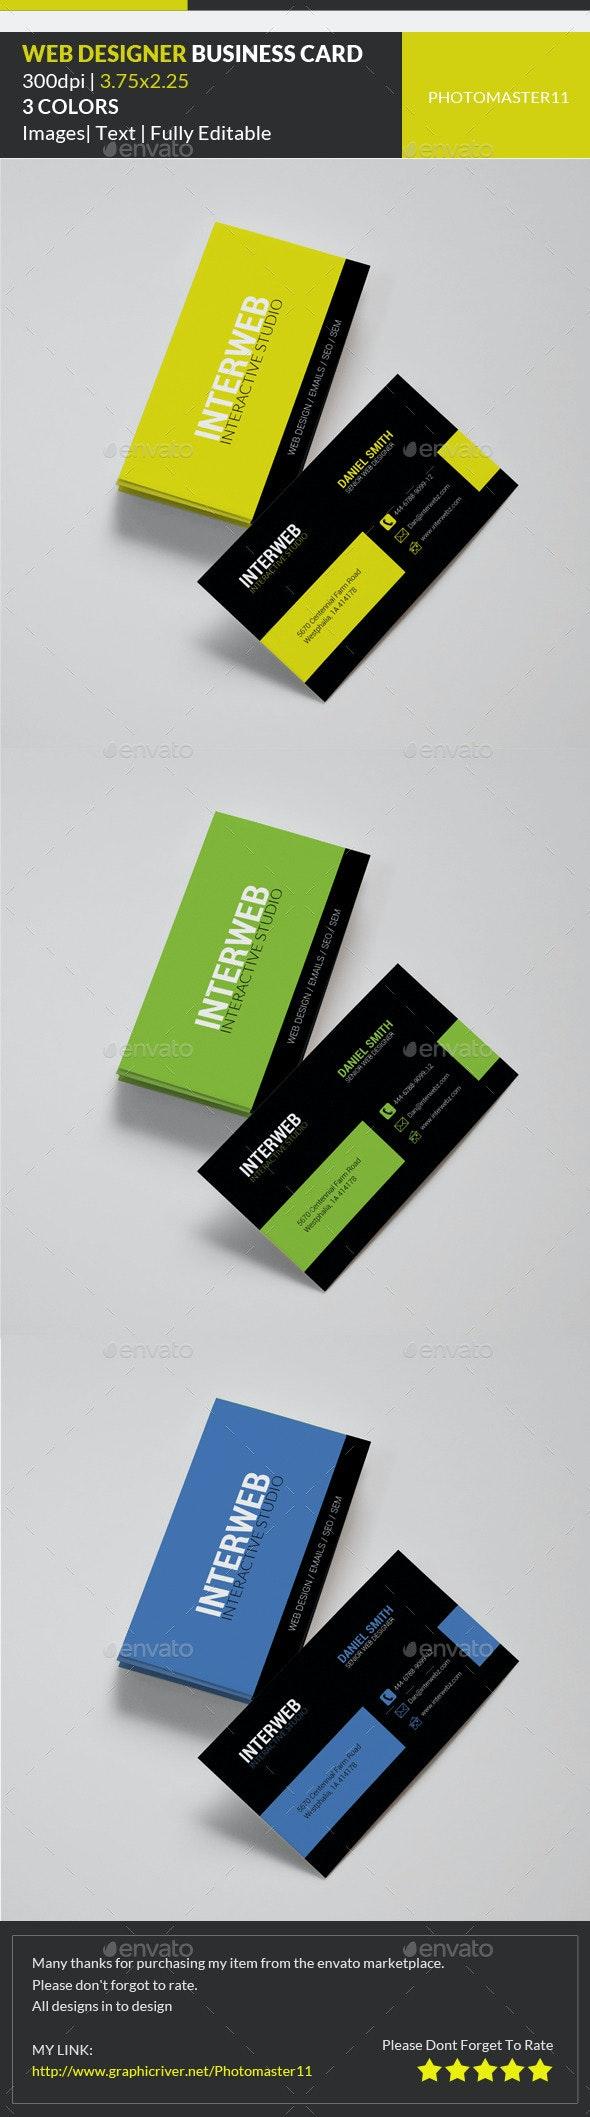 Web Designer Business Card - Corporate Business Cards